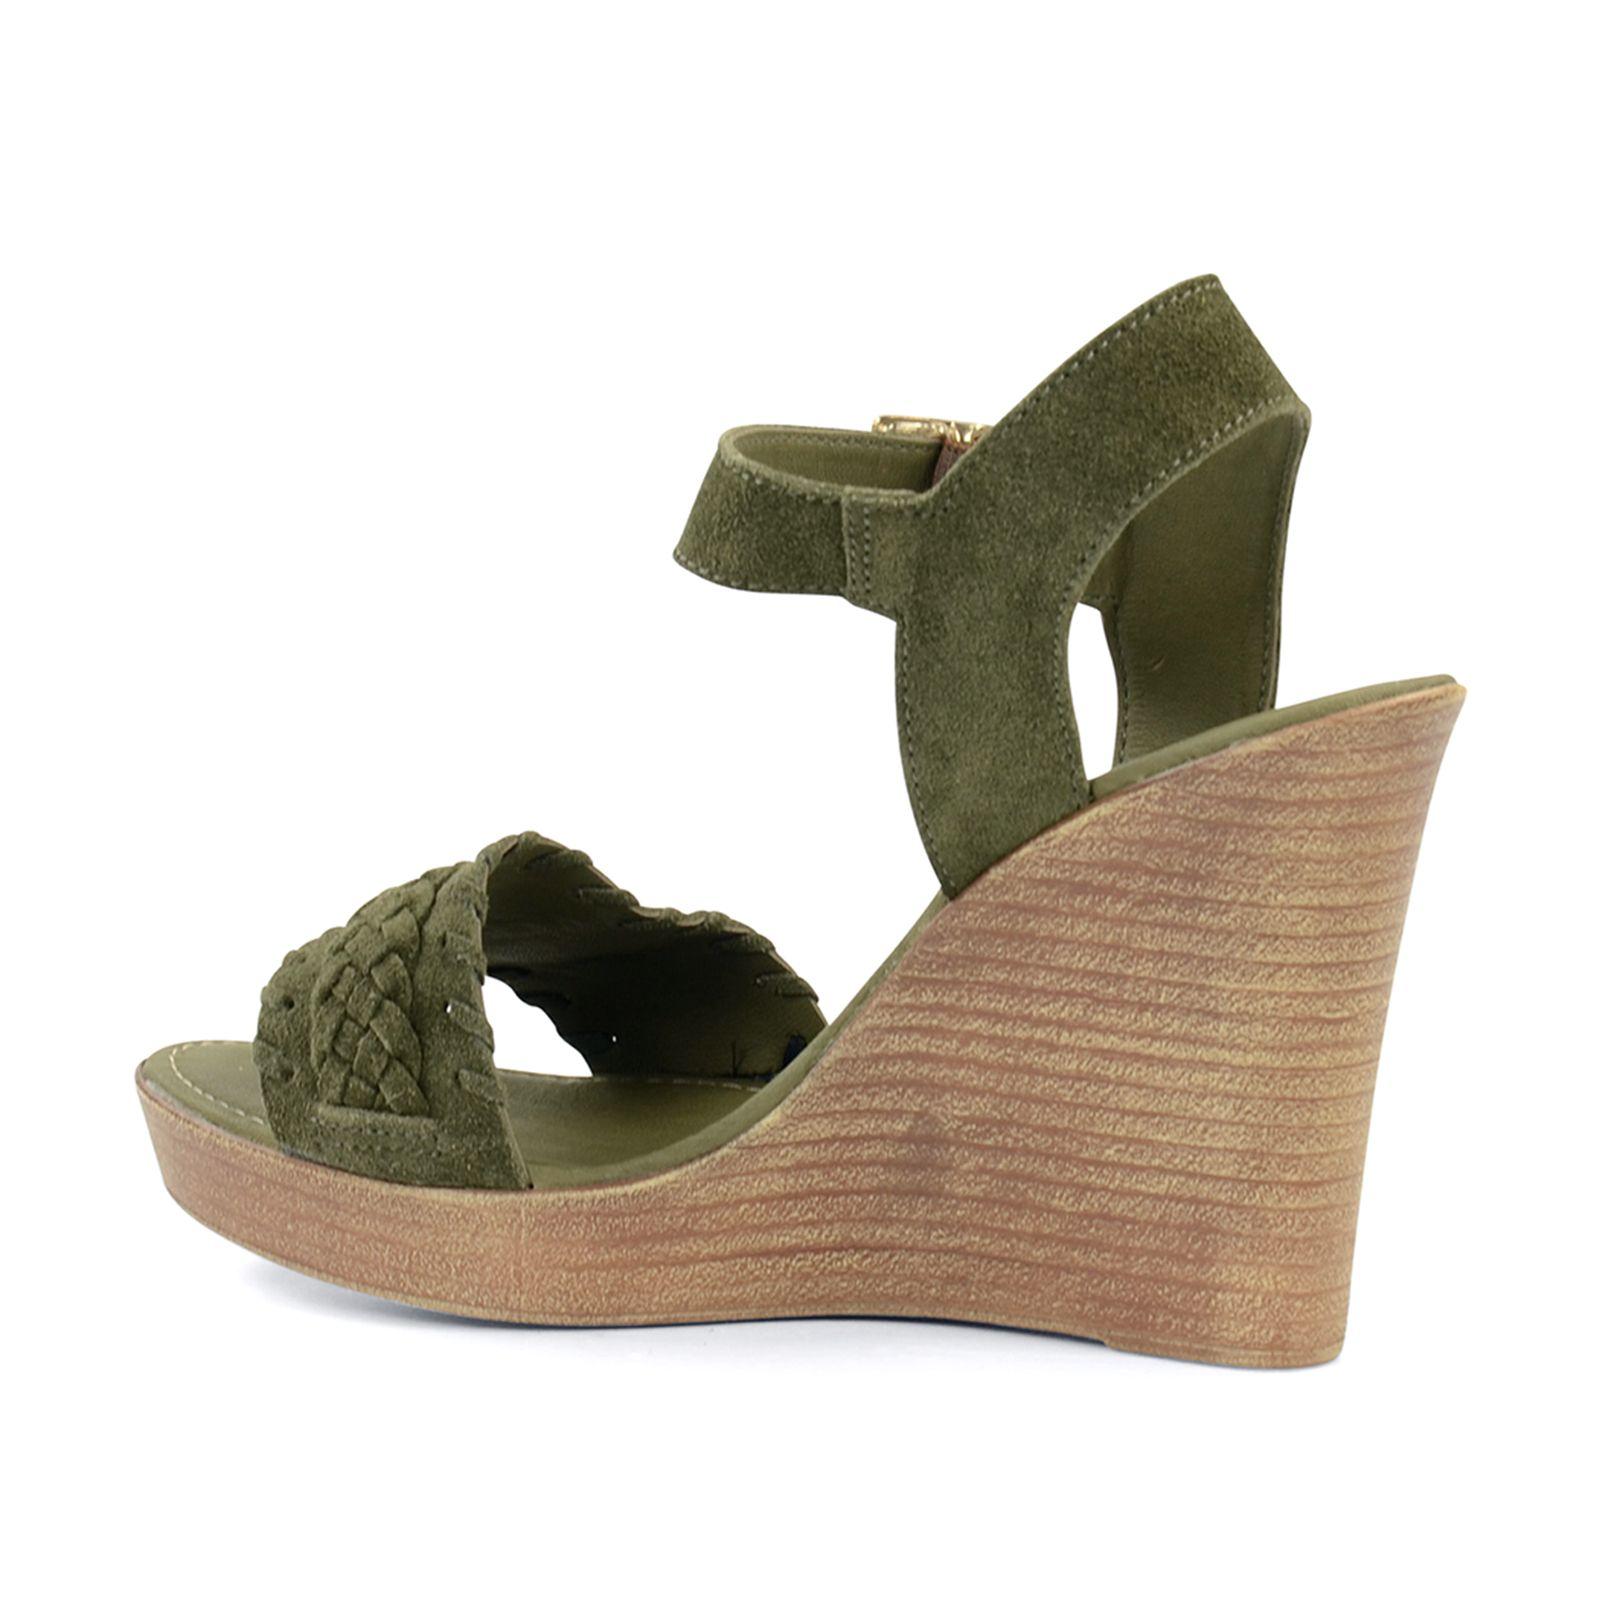 Grune Farbe Wow : Grüne Keilsandaletten  Damenschuhe  4999  SachaSchuhede